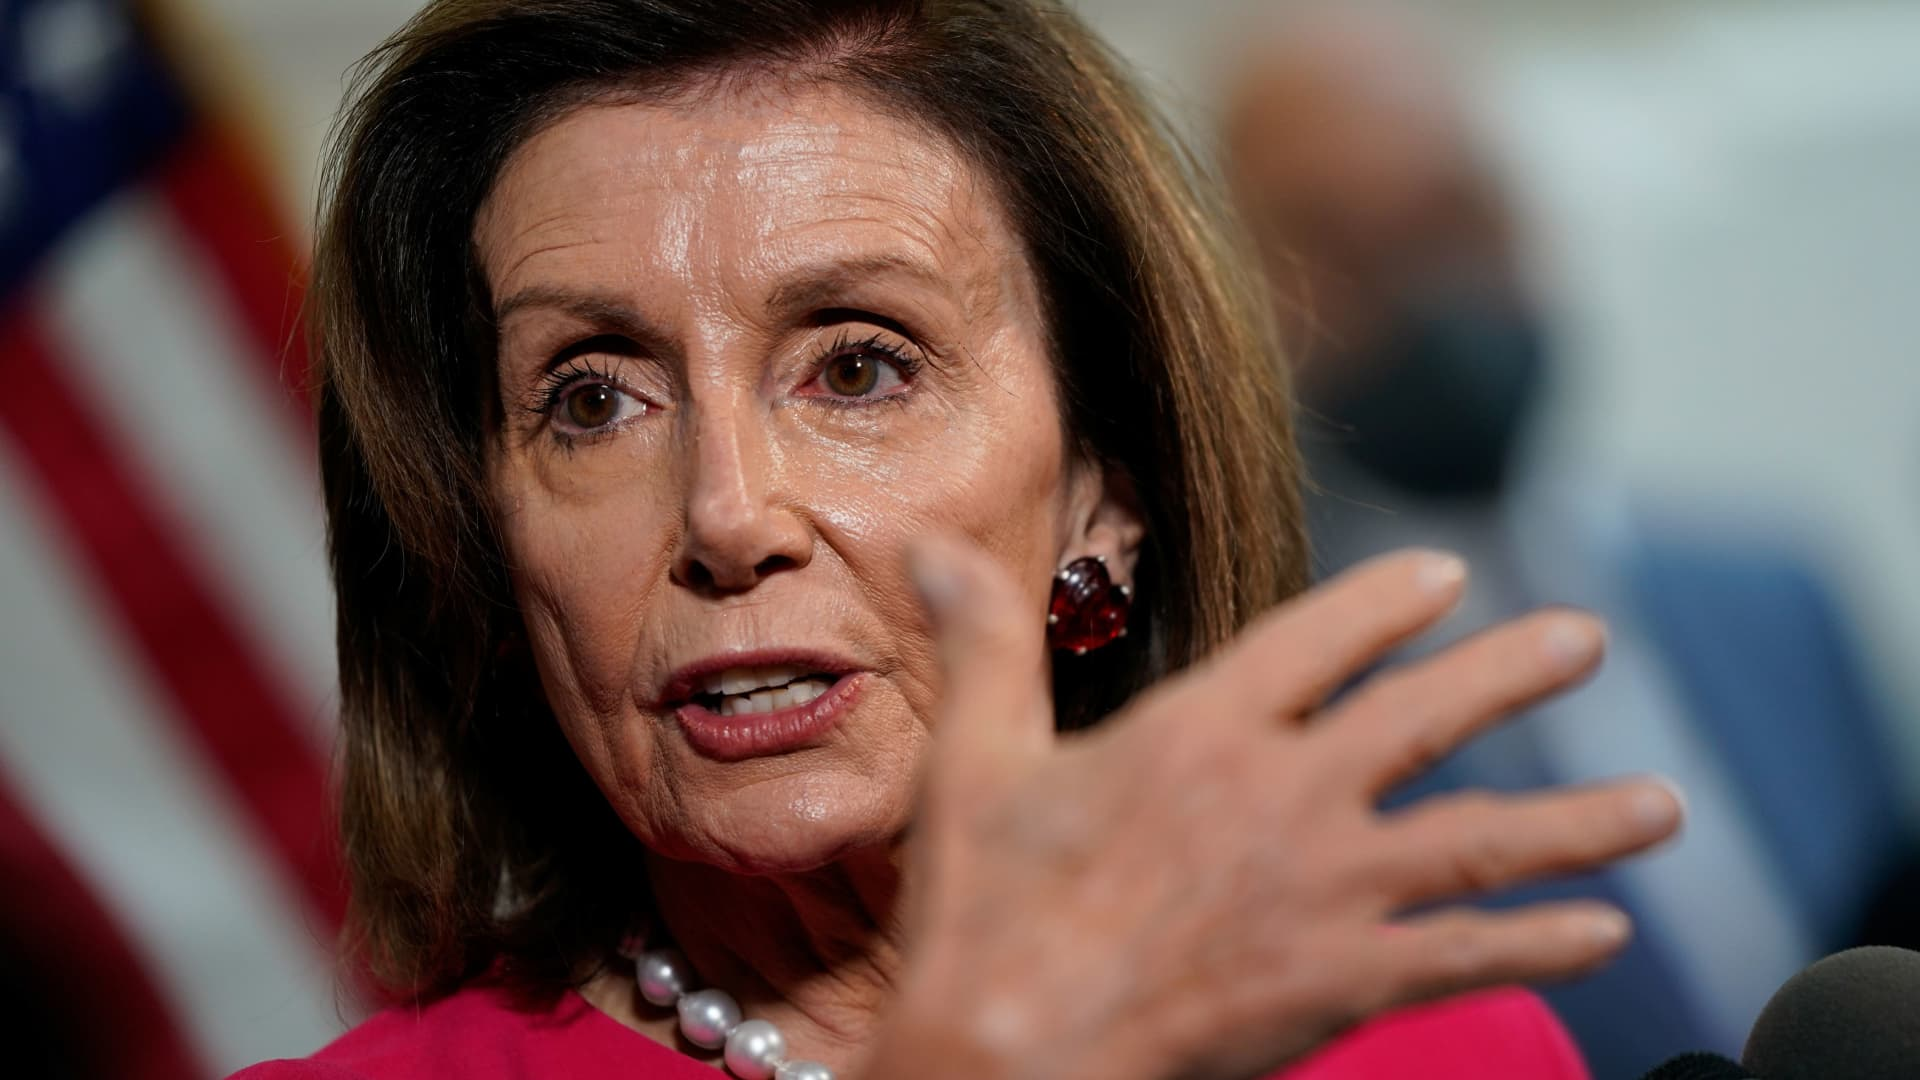 House Speaker Nancy Pelosi (D-CA) speaks to reporters at the U.S. Capitol in Washington, U.S., September 28, 2021.